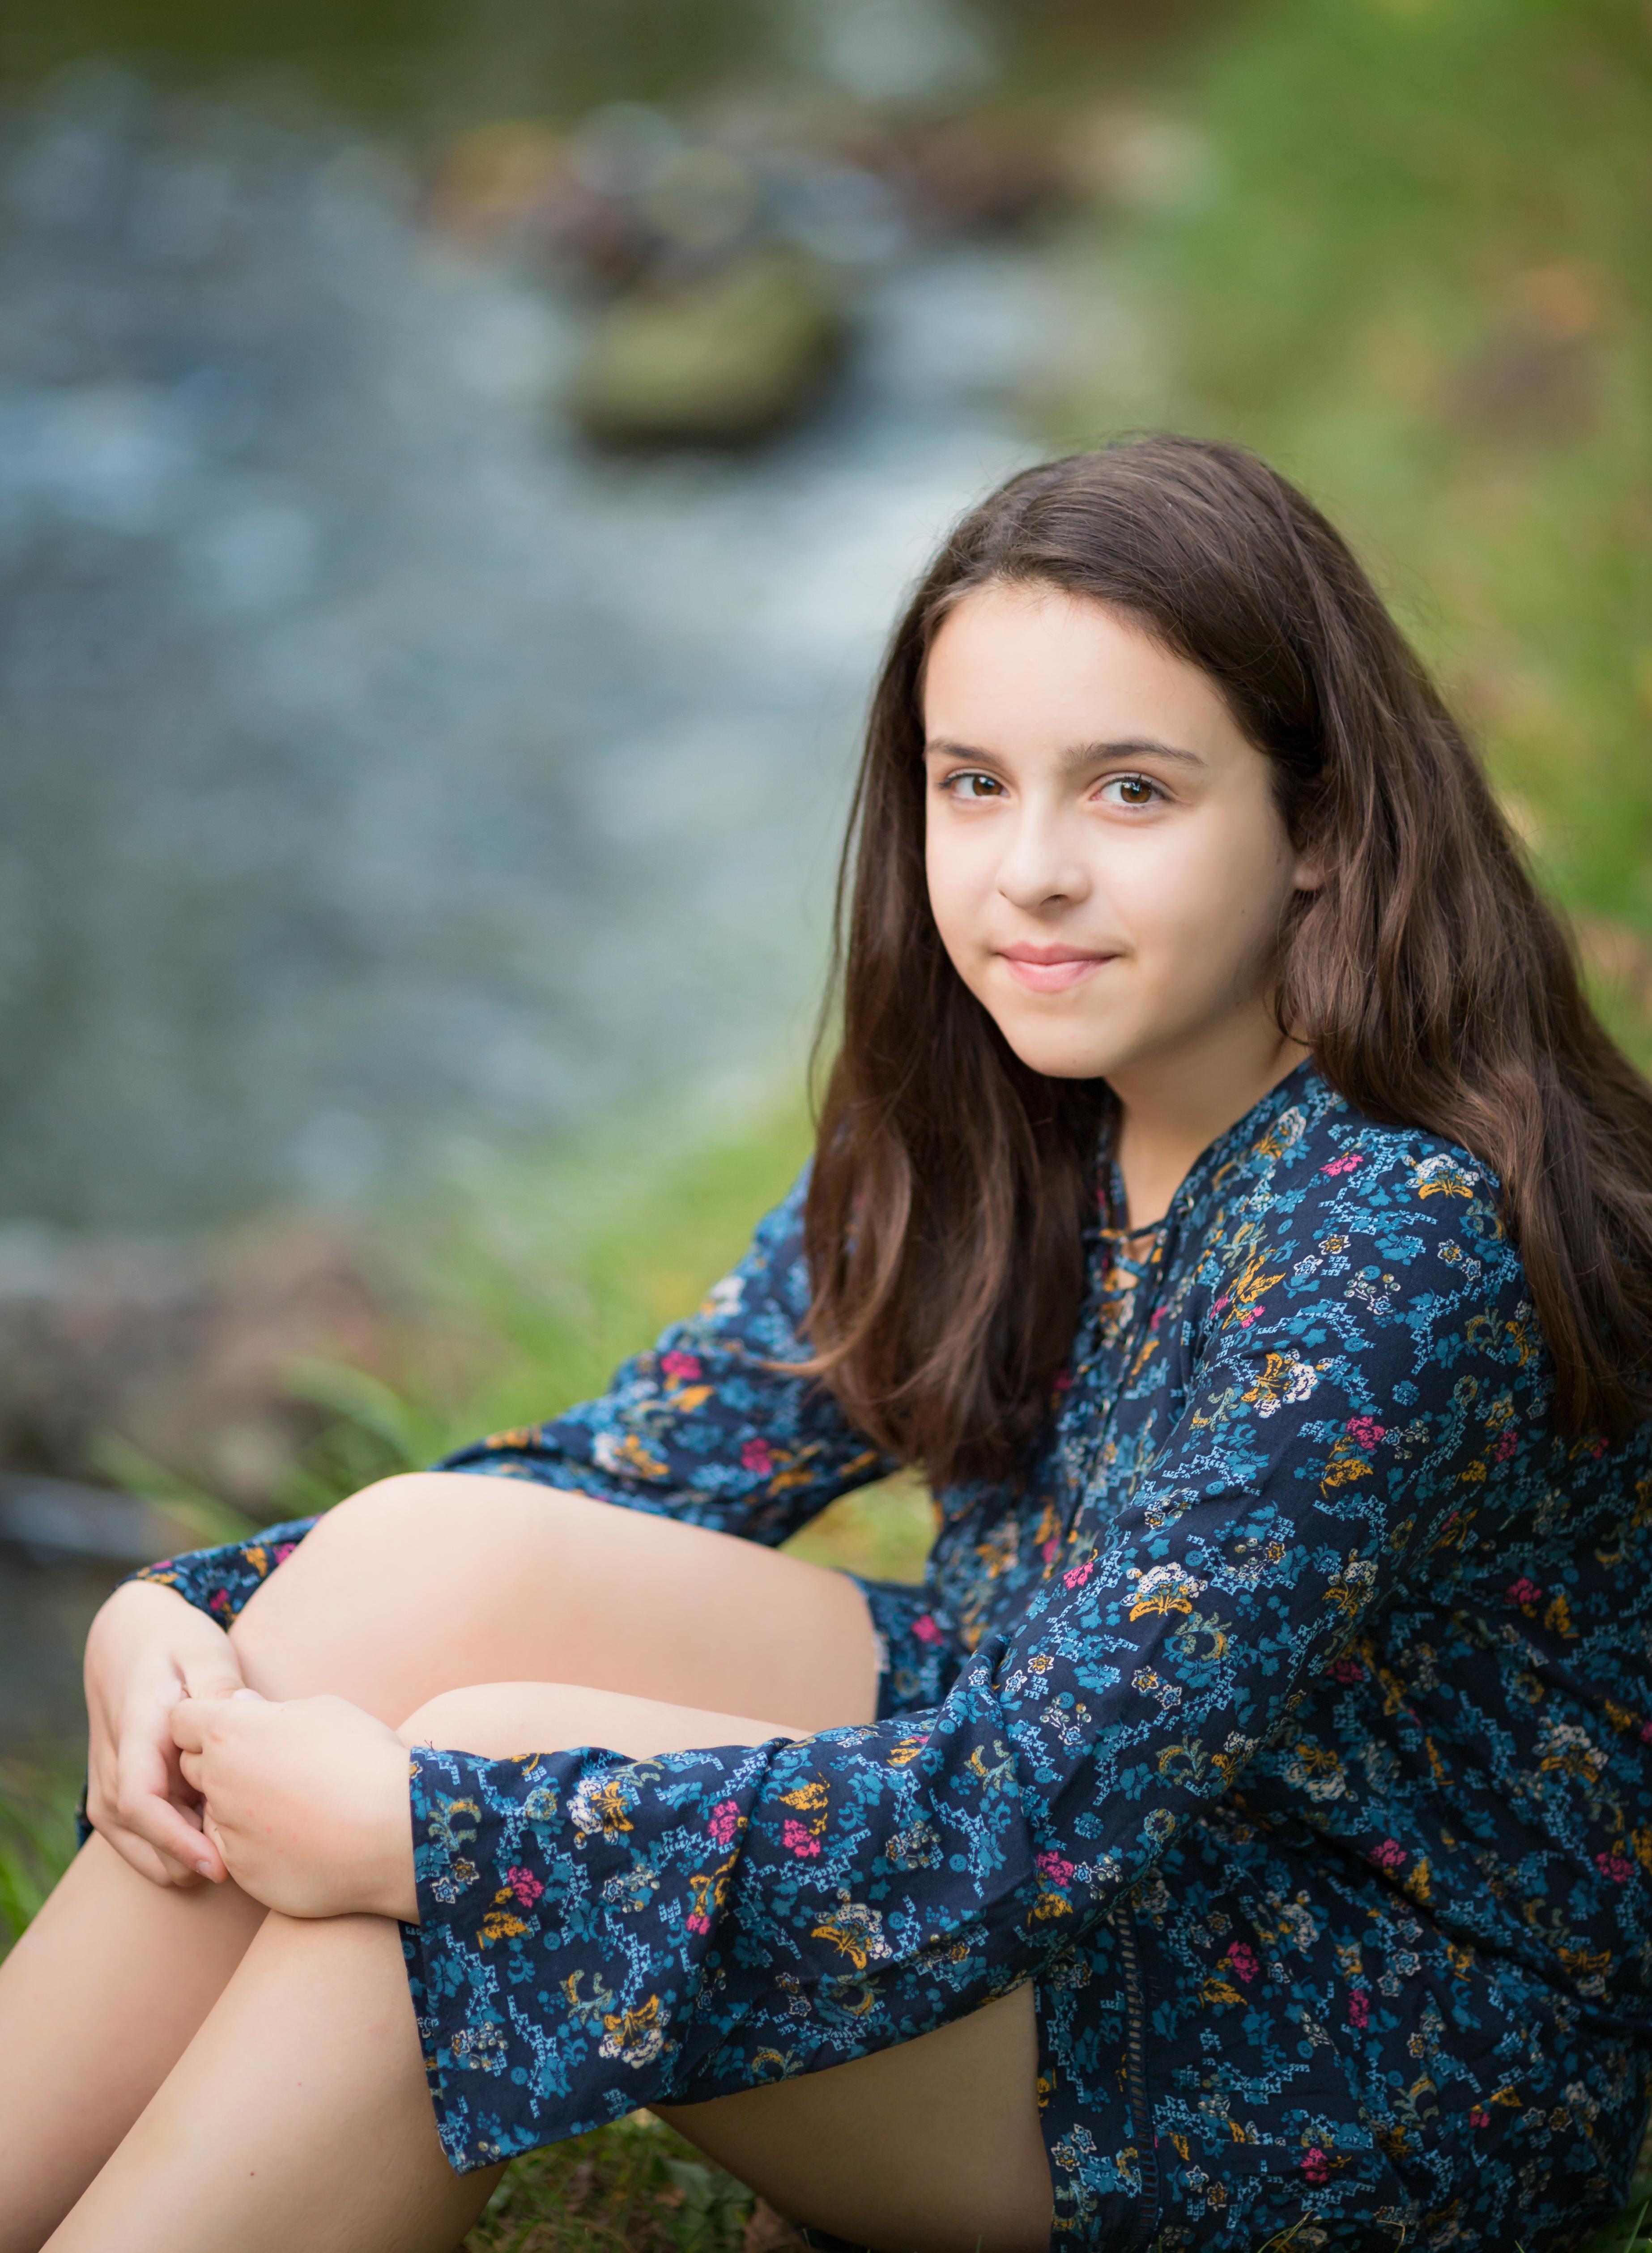 Photography of teen